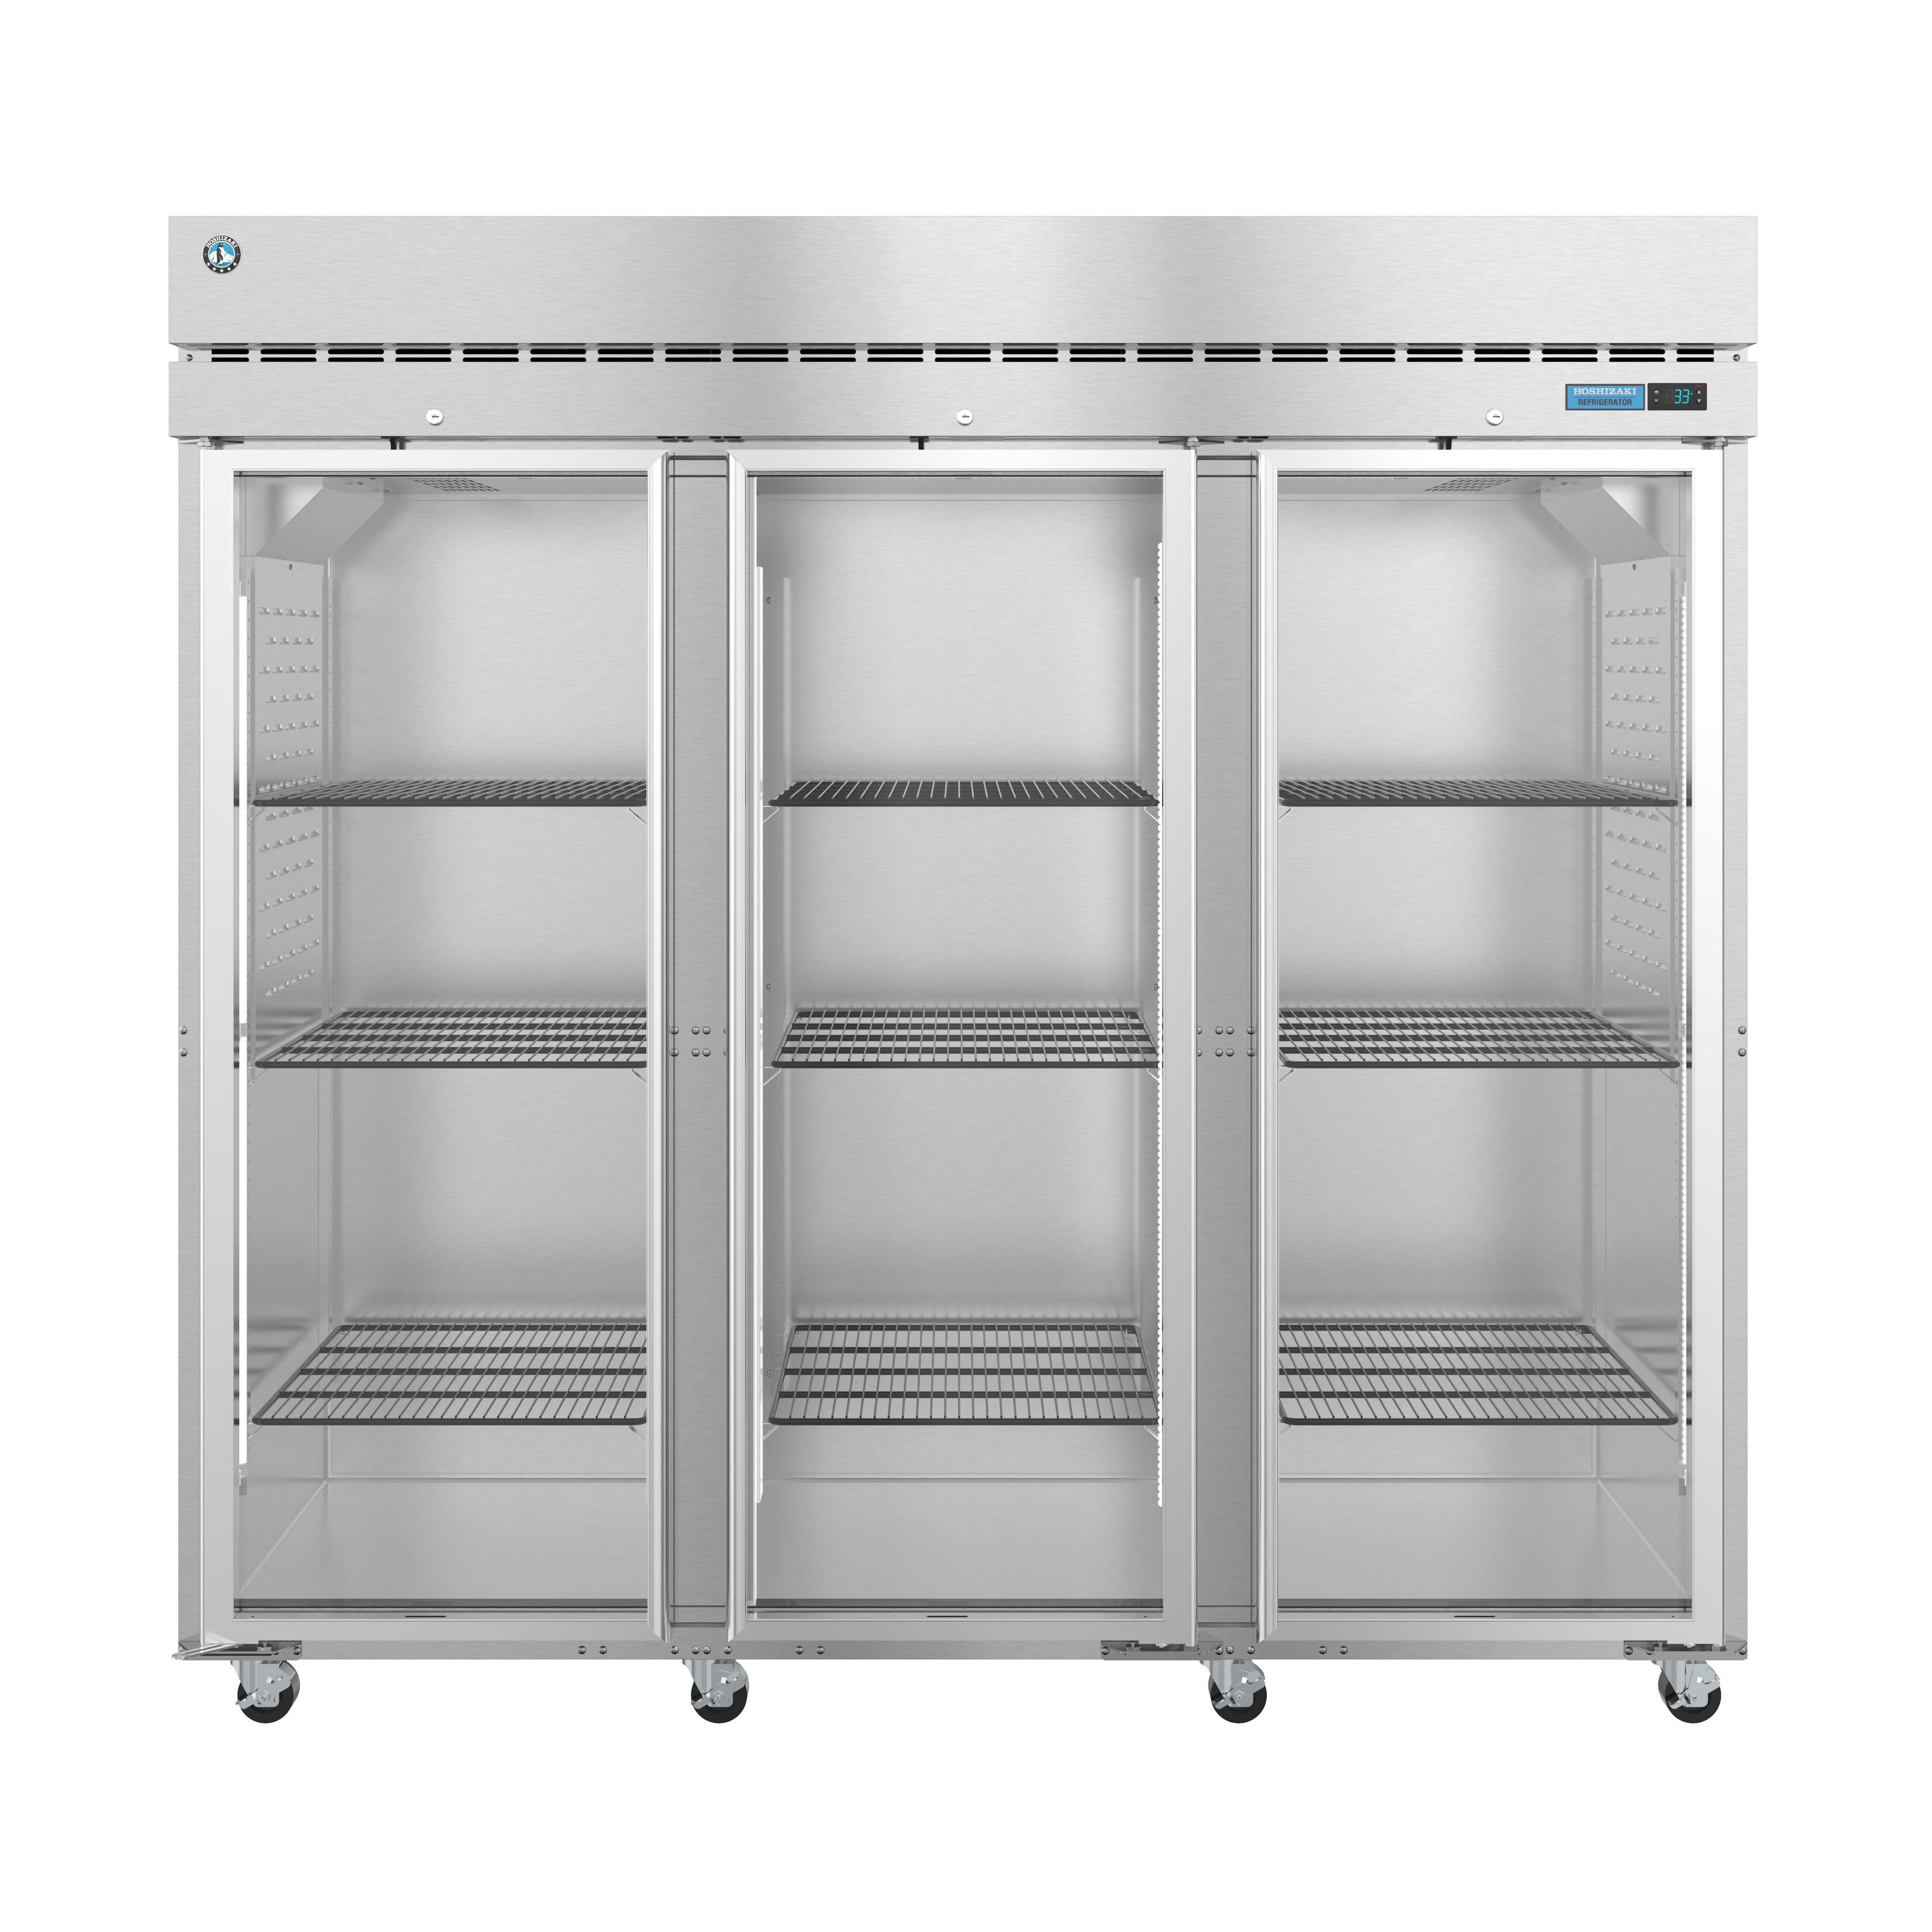 Hoshizaki R3A-FG reach-in refrigerators & freezers